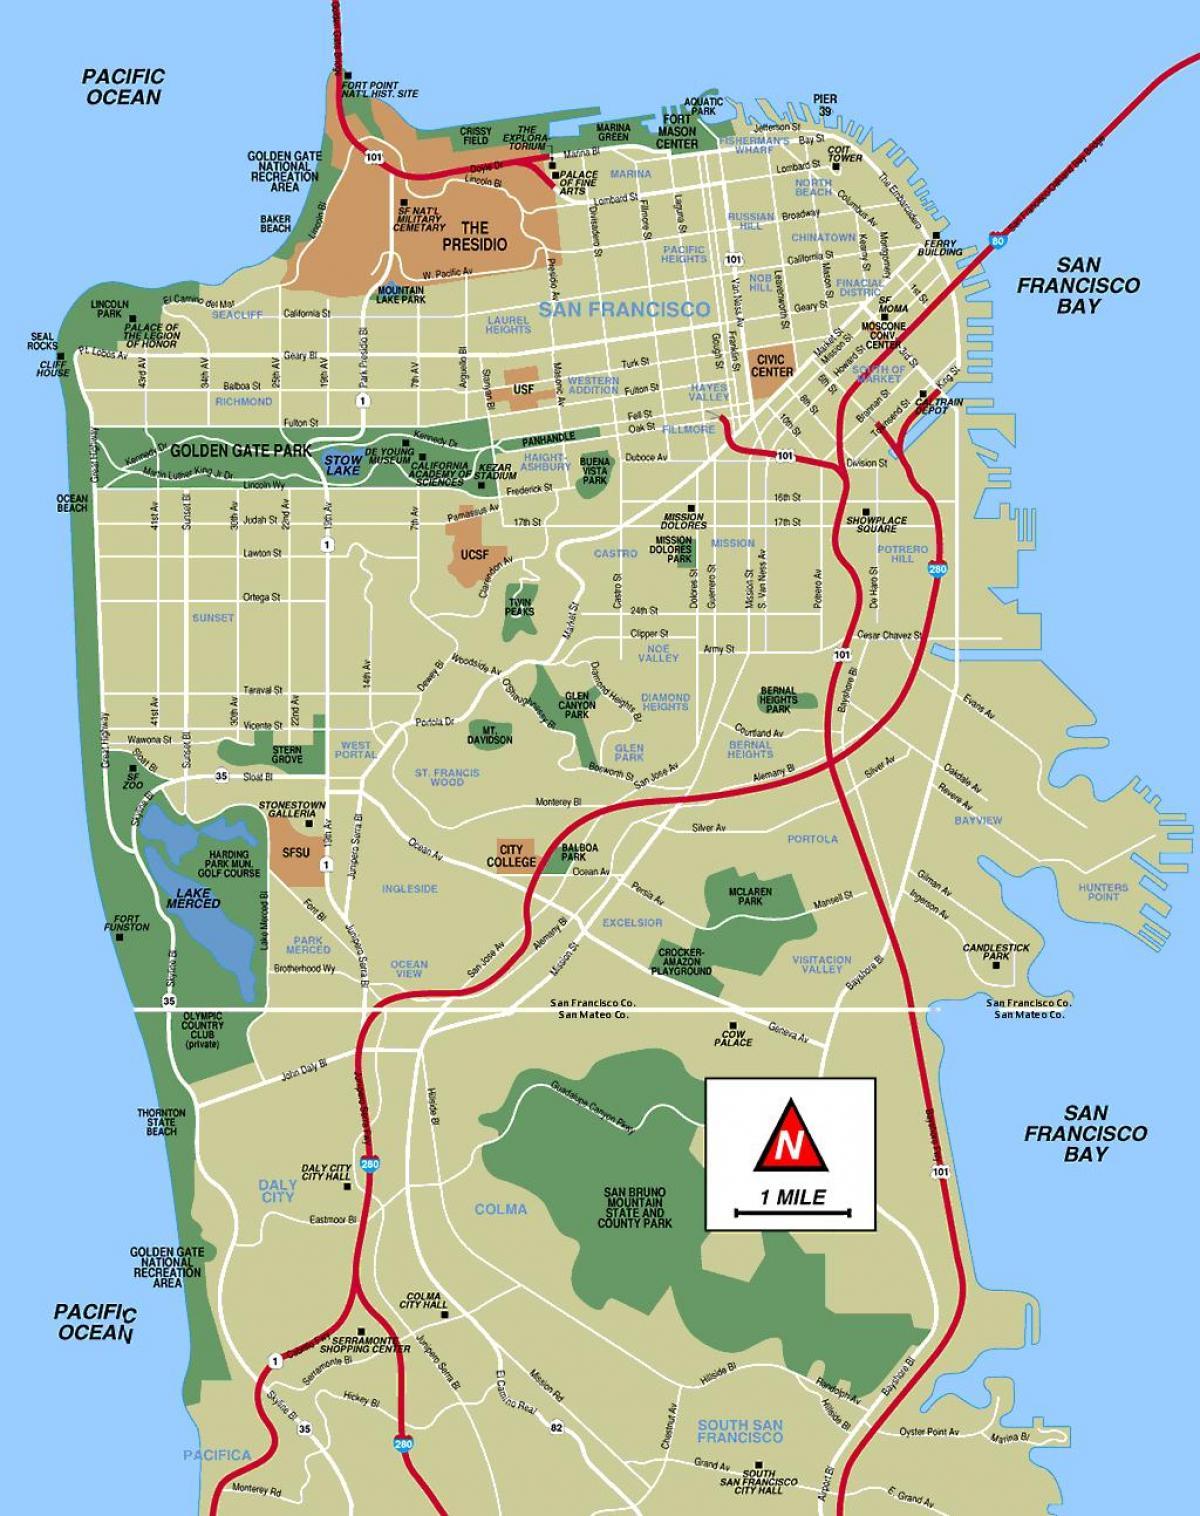 Mapa De San Francisco.San Francisco Offline Map Mapa De San Francisco Sin